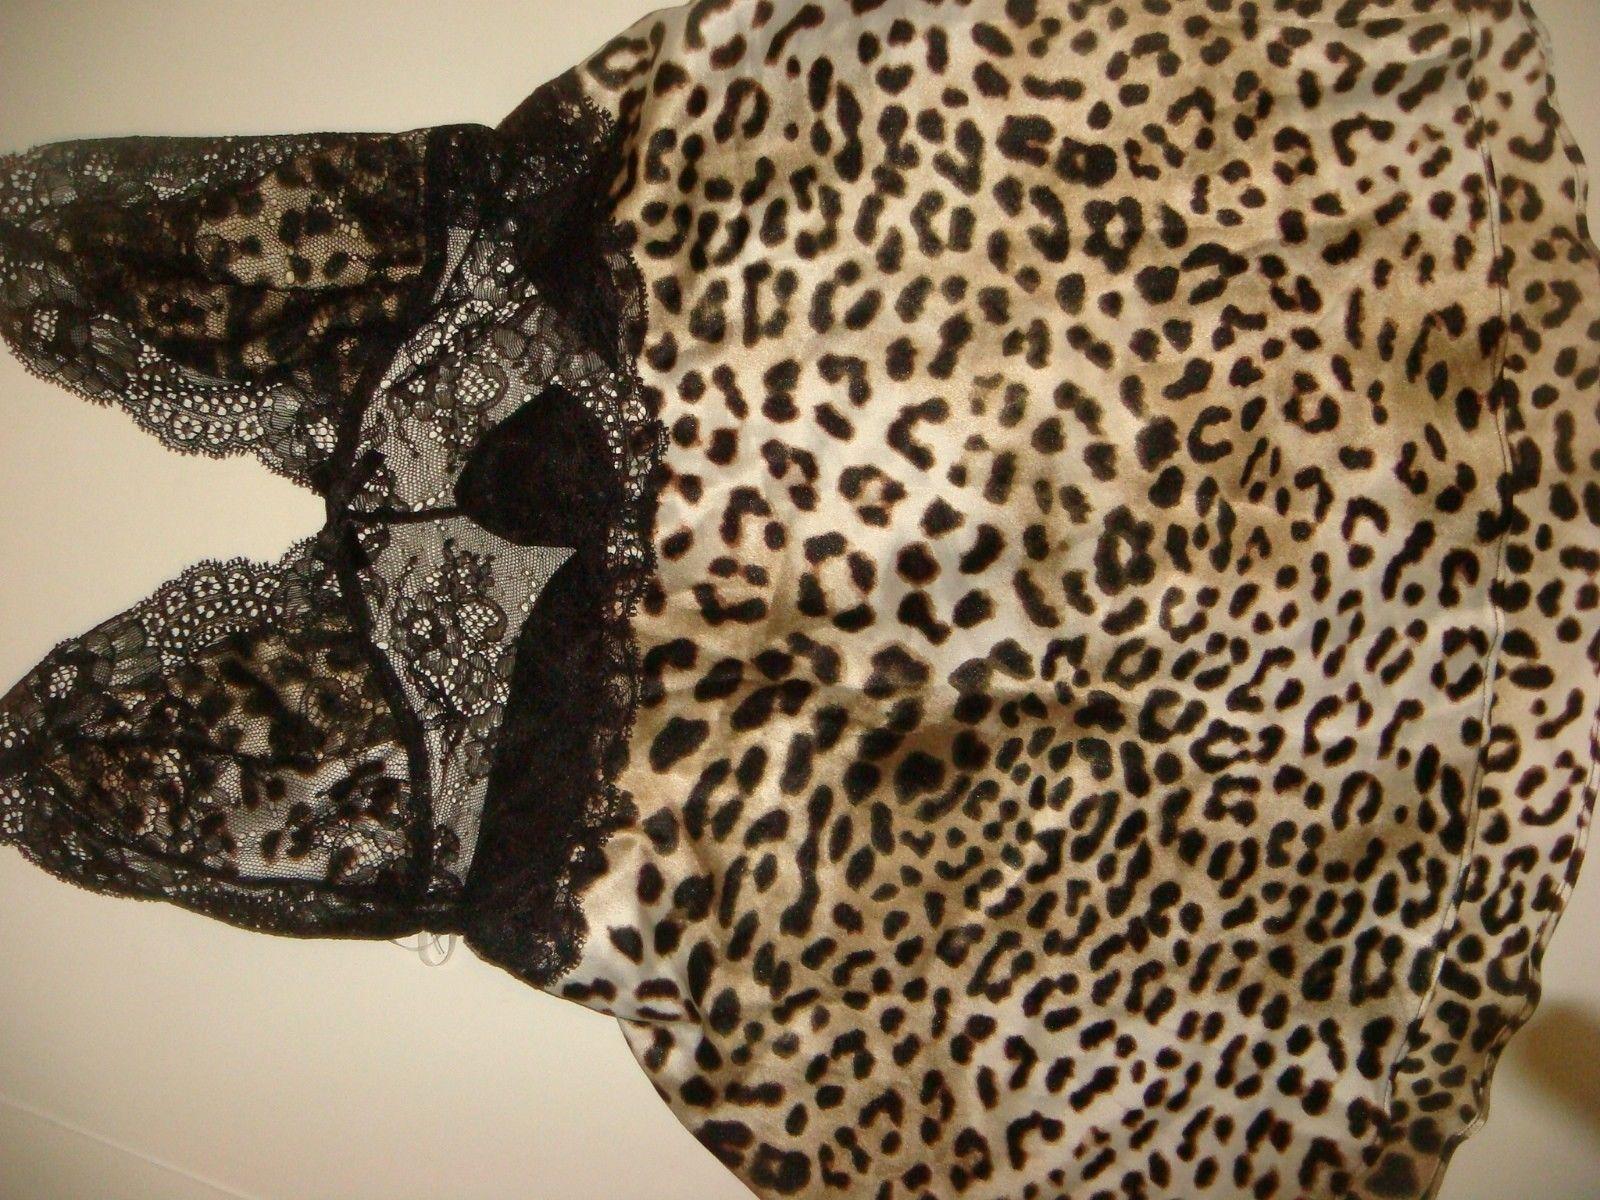 76cafa1dda4a2 Nwt Victoria's Secret S Slip Babydoll+Panty and 50 similar items